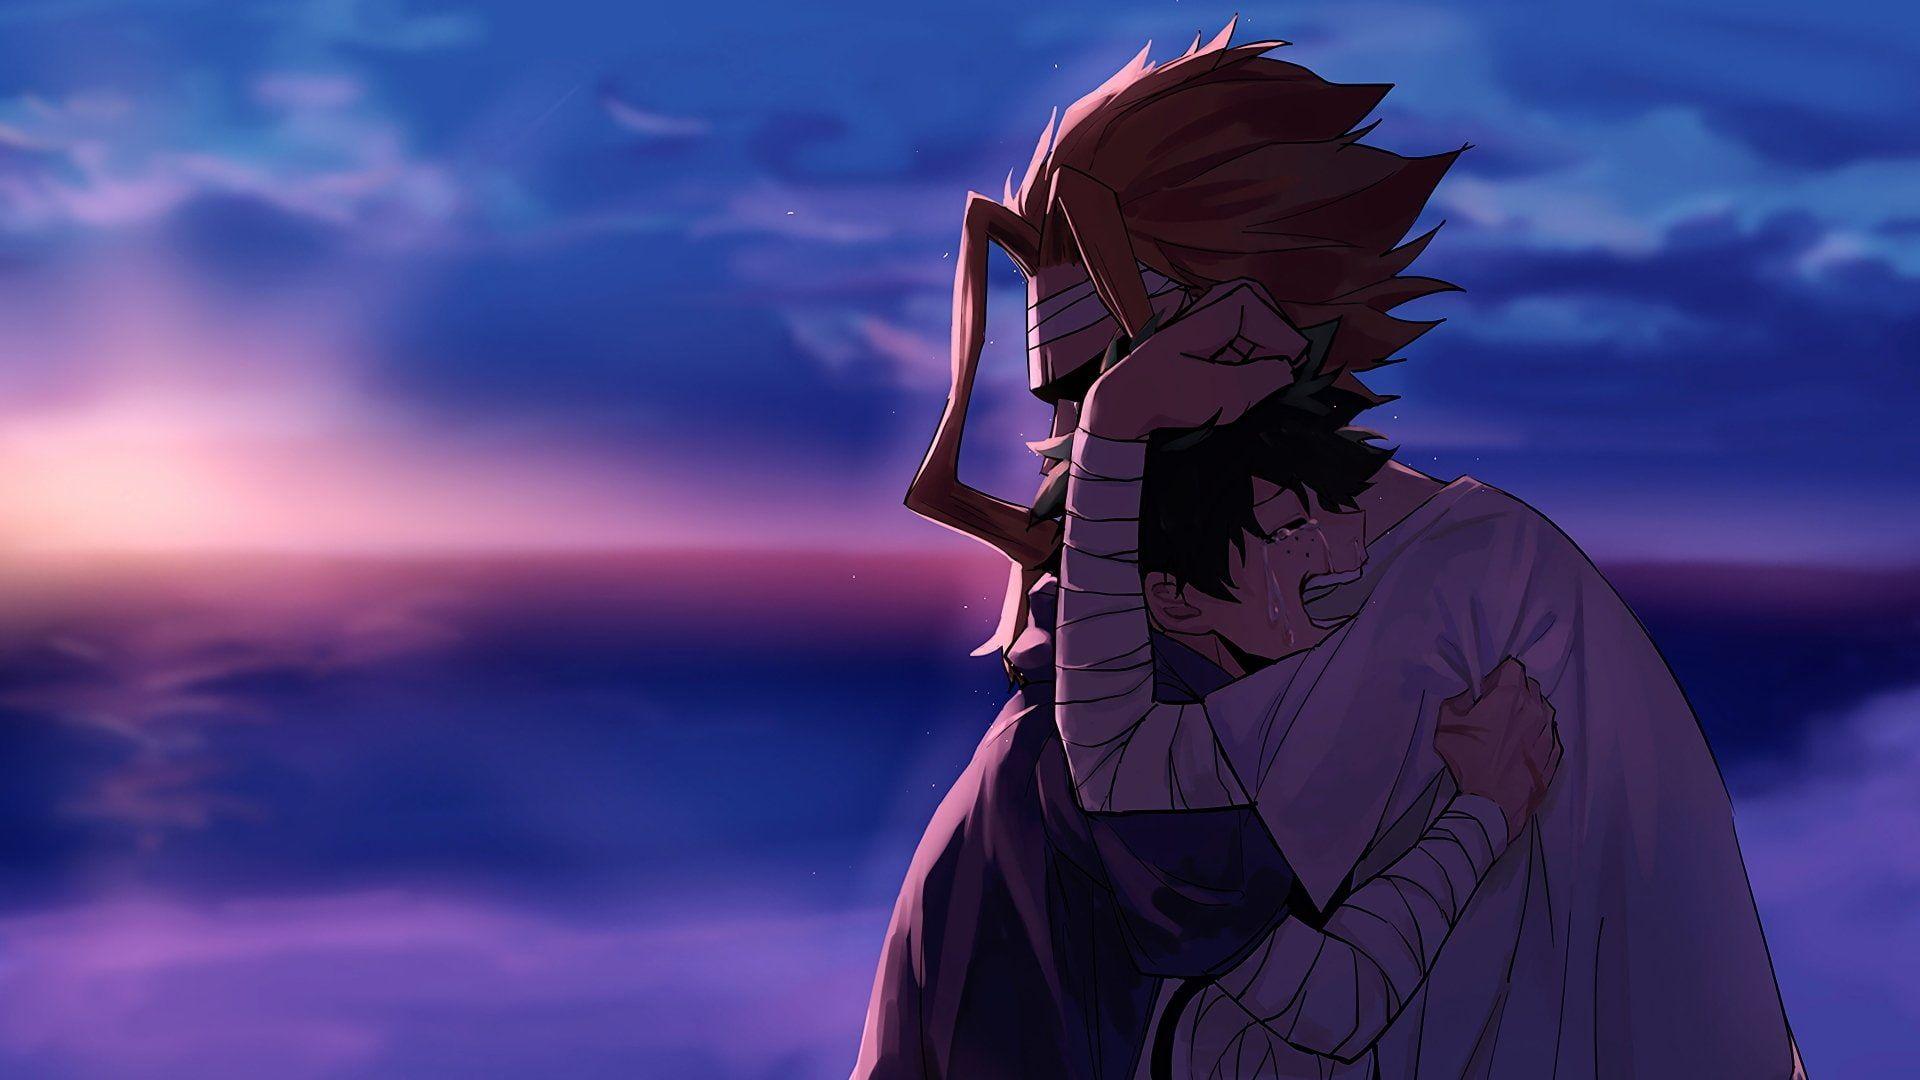 Hd Wallpaper Anime My Hero Academia All Might Boy Crying Green Hero My Hero Academia Boku No Hero Academia